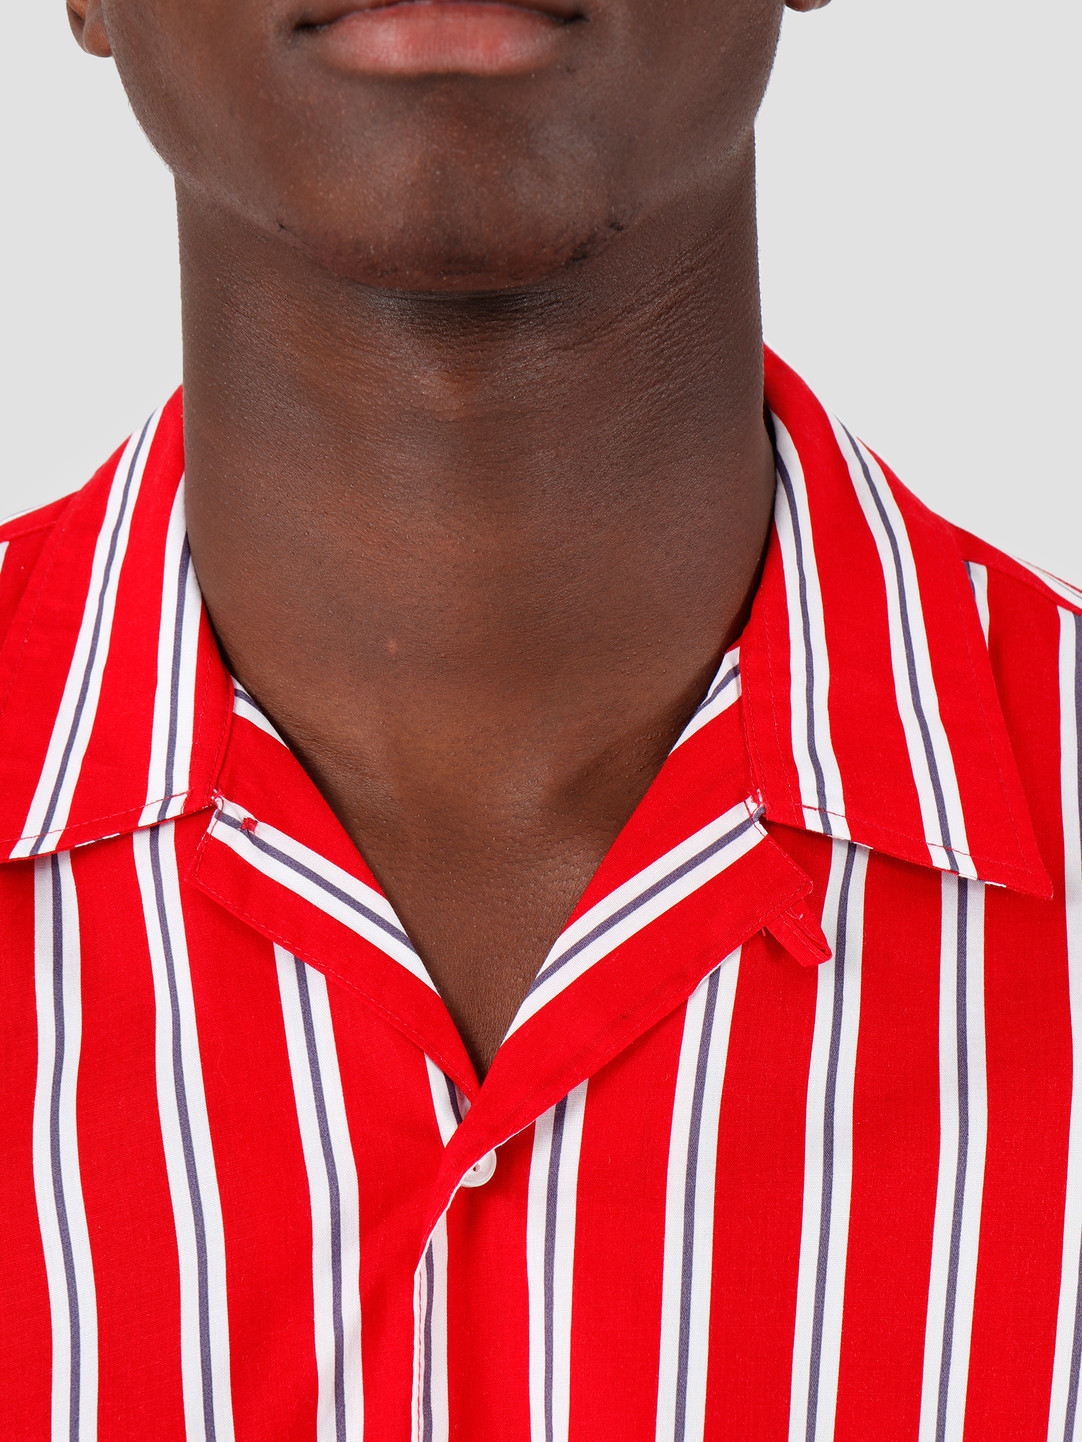 Kronstadt Kronstadt Cuba Short Sleeve Shirt GR.81 Red White Blue KS2662